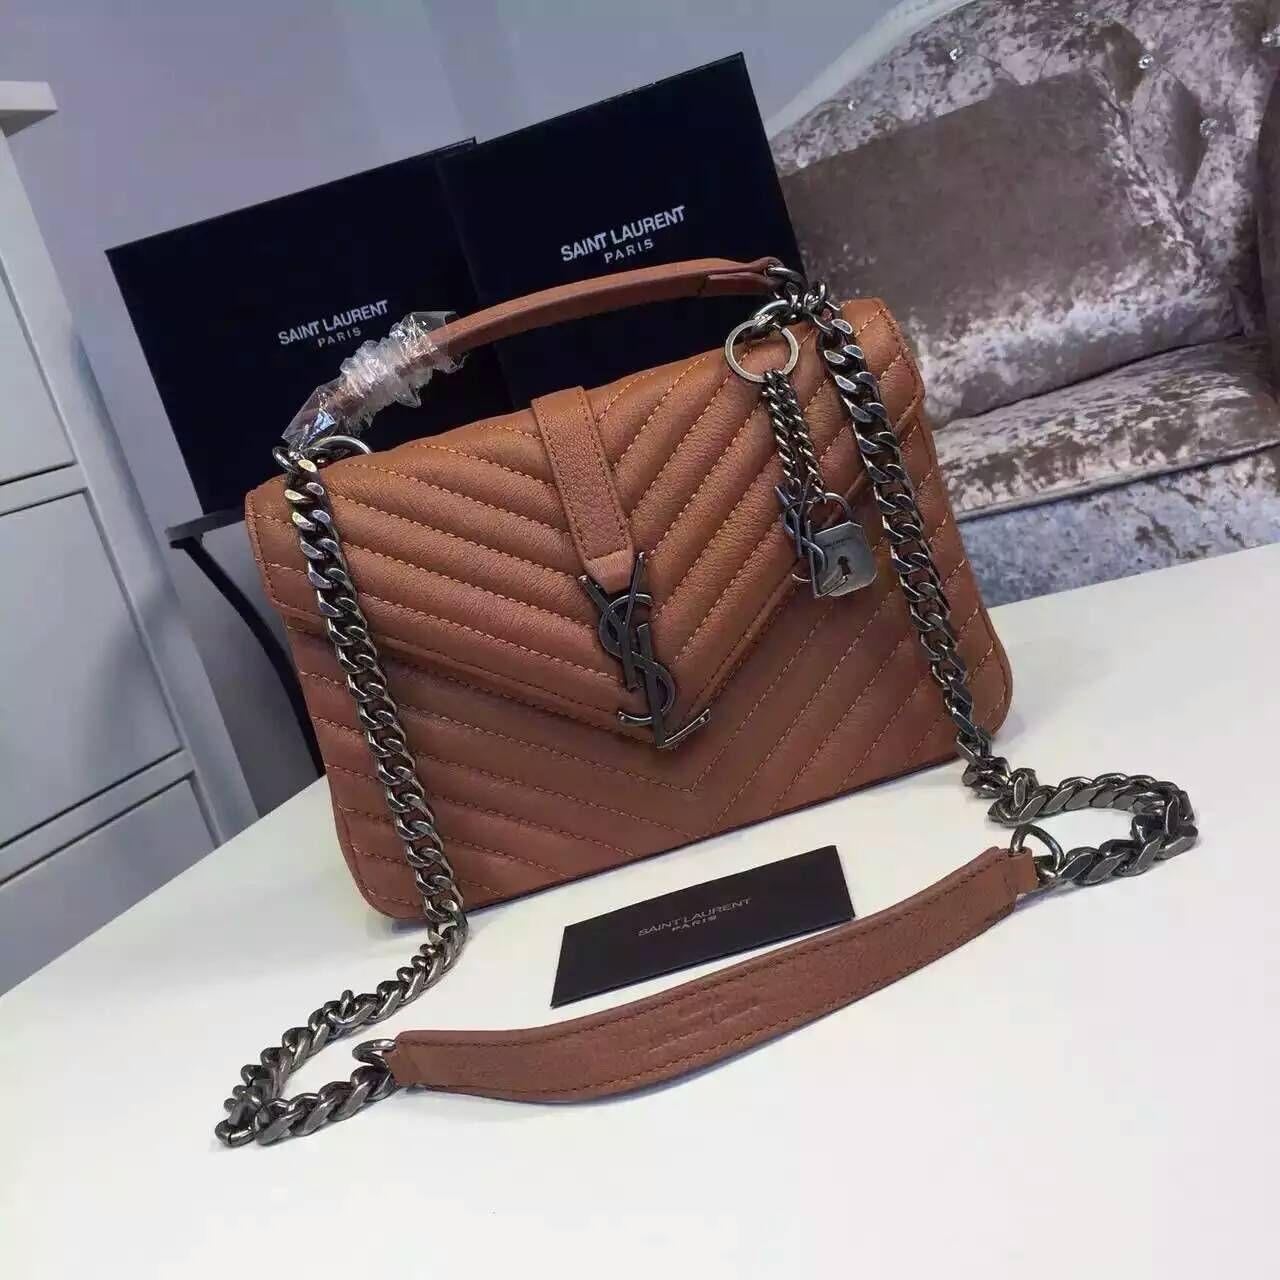 2016 New Saint Laurent Bag Cheap Sale-Saint Laurent Classic Medium COLLEGE MONOGRAM  Bag in Light Brown MATELASSE Leather 9c33918c1b